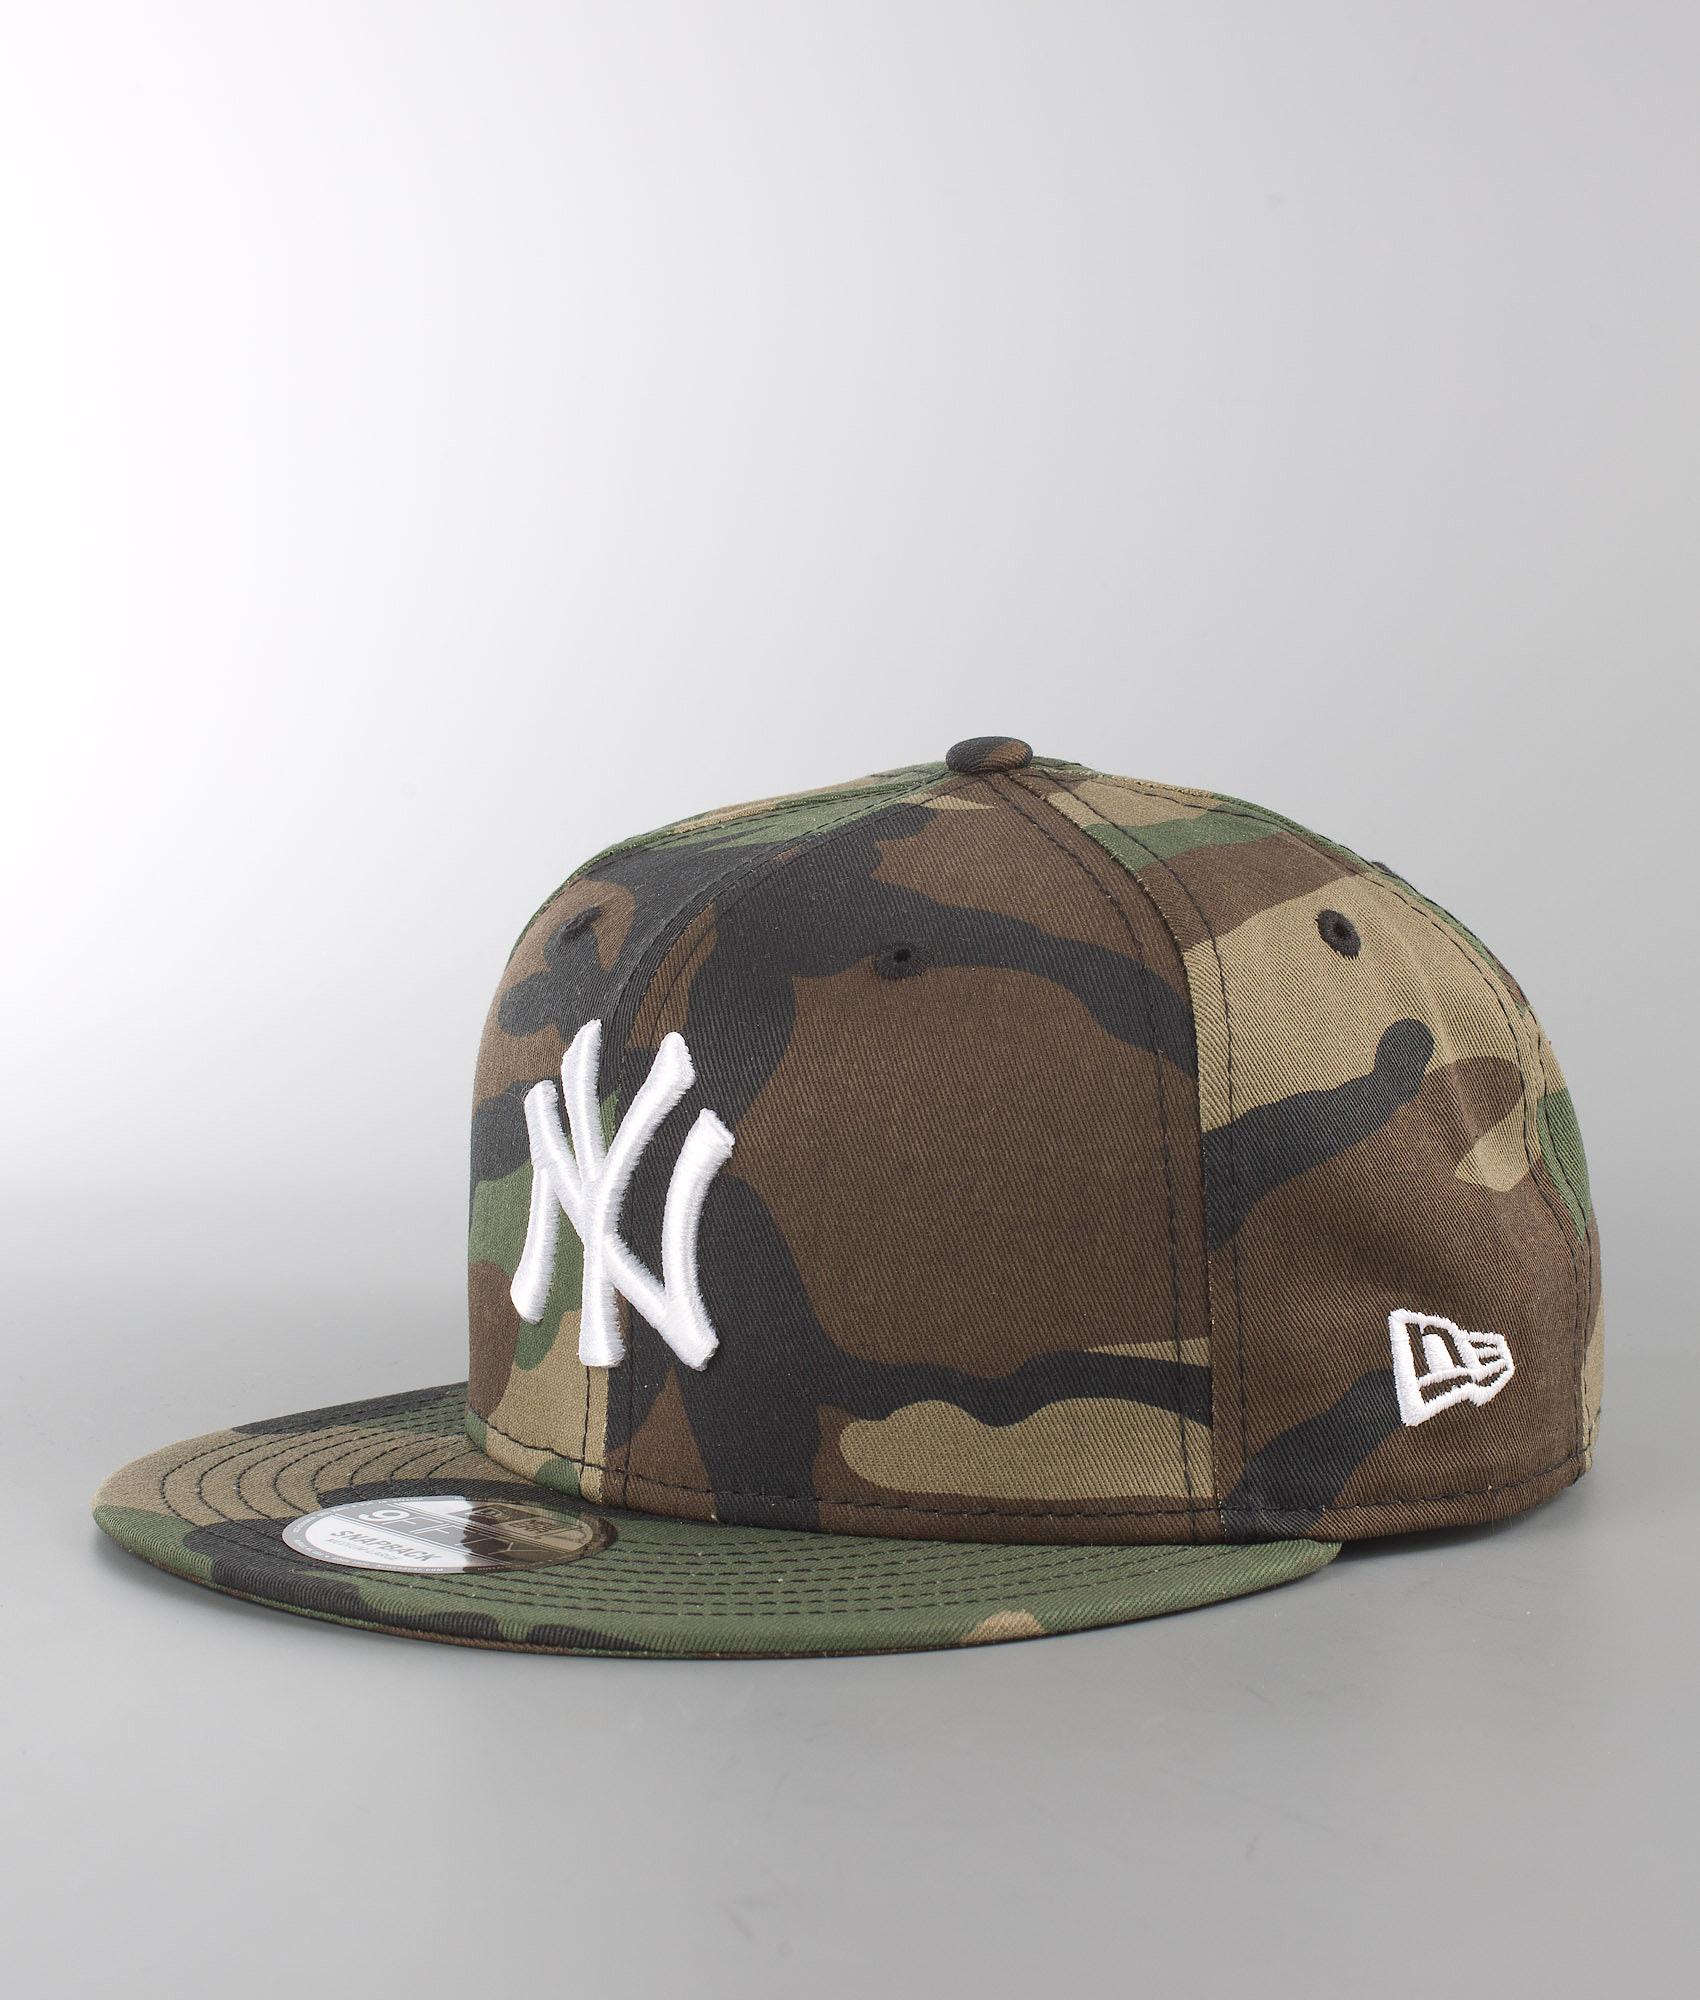 17f88688639 New Era League Essential 9Fifty New York Yankees Cap Camo ...